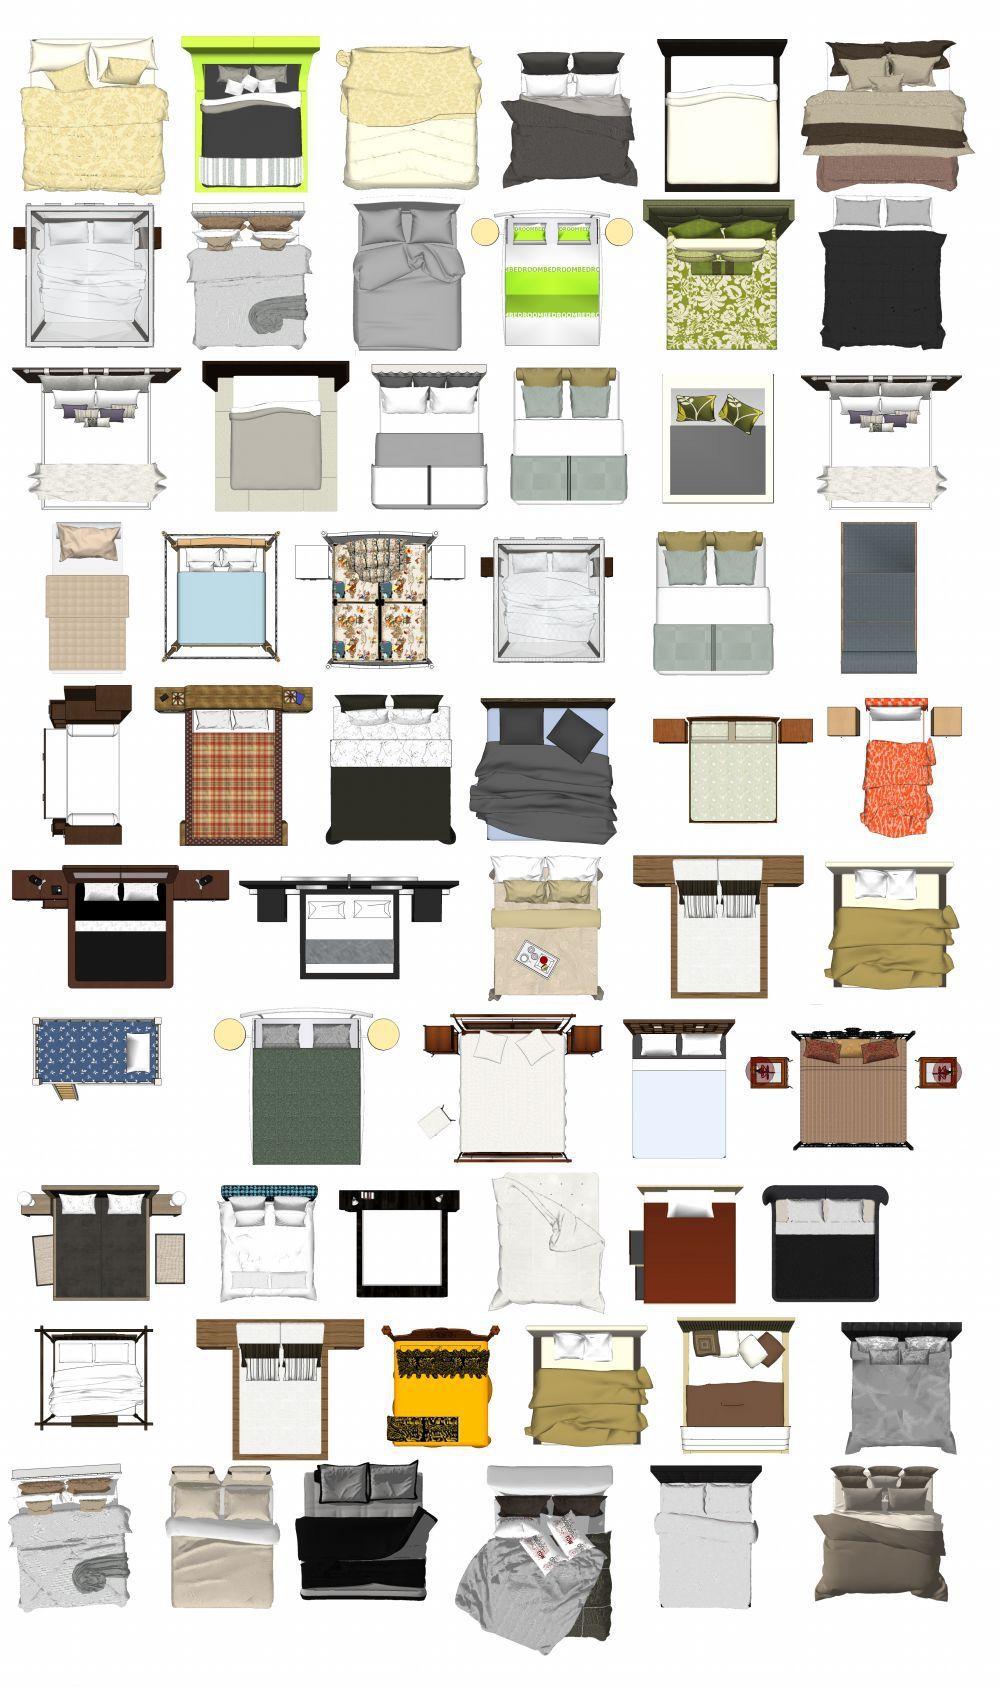 Photoshop Psd Bed Blocks 1 Interior Design Plan Interior Design